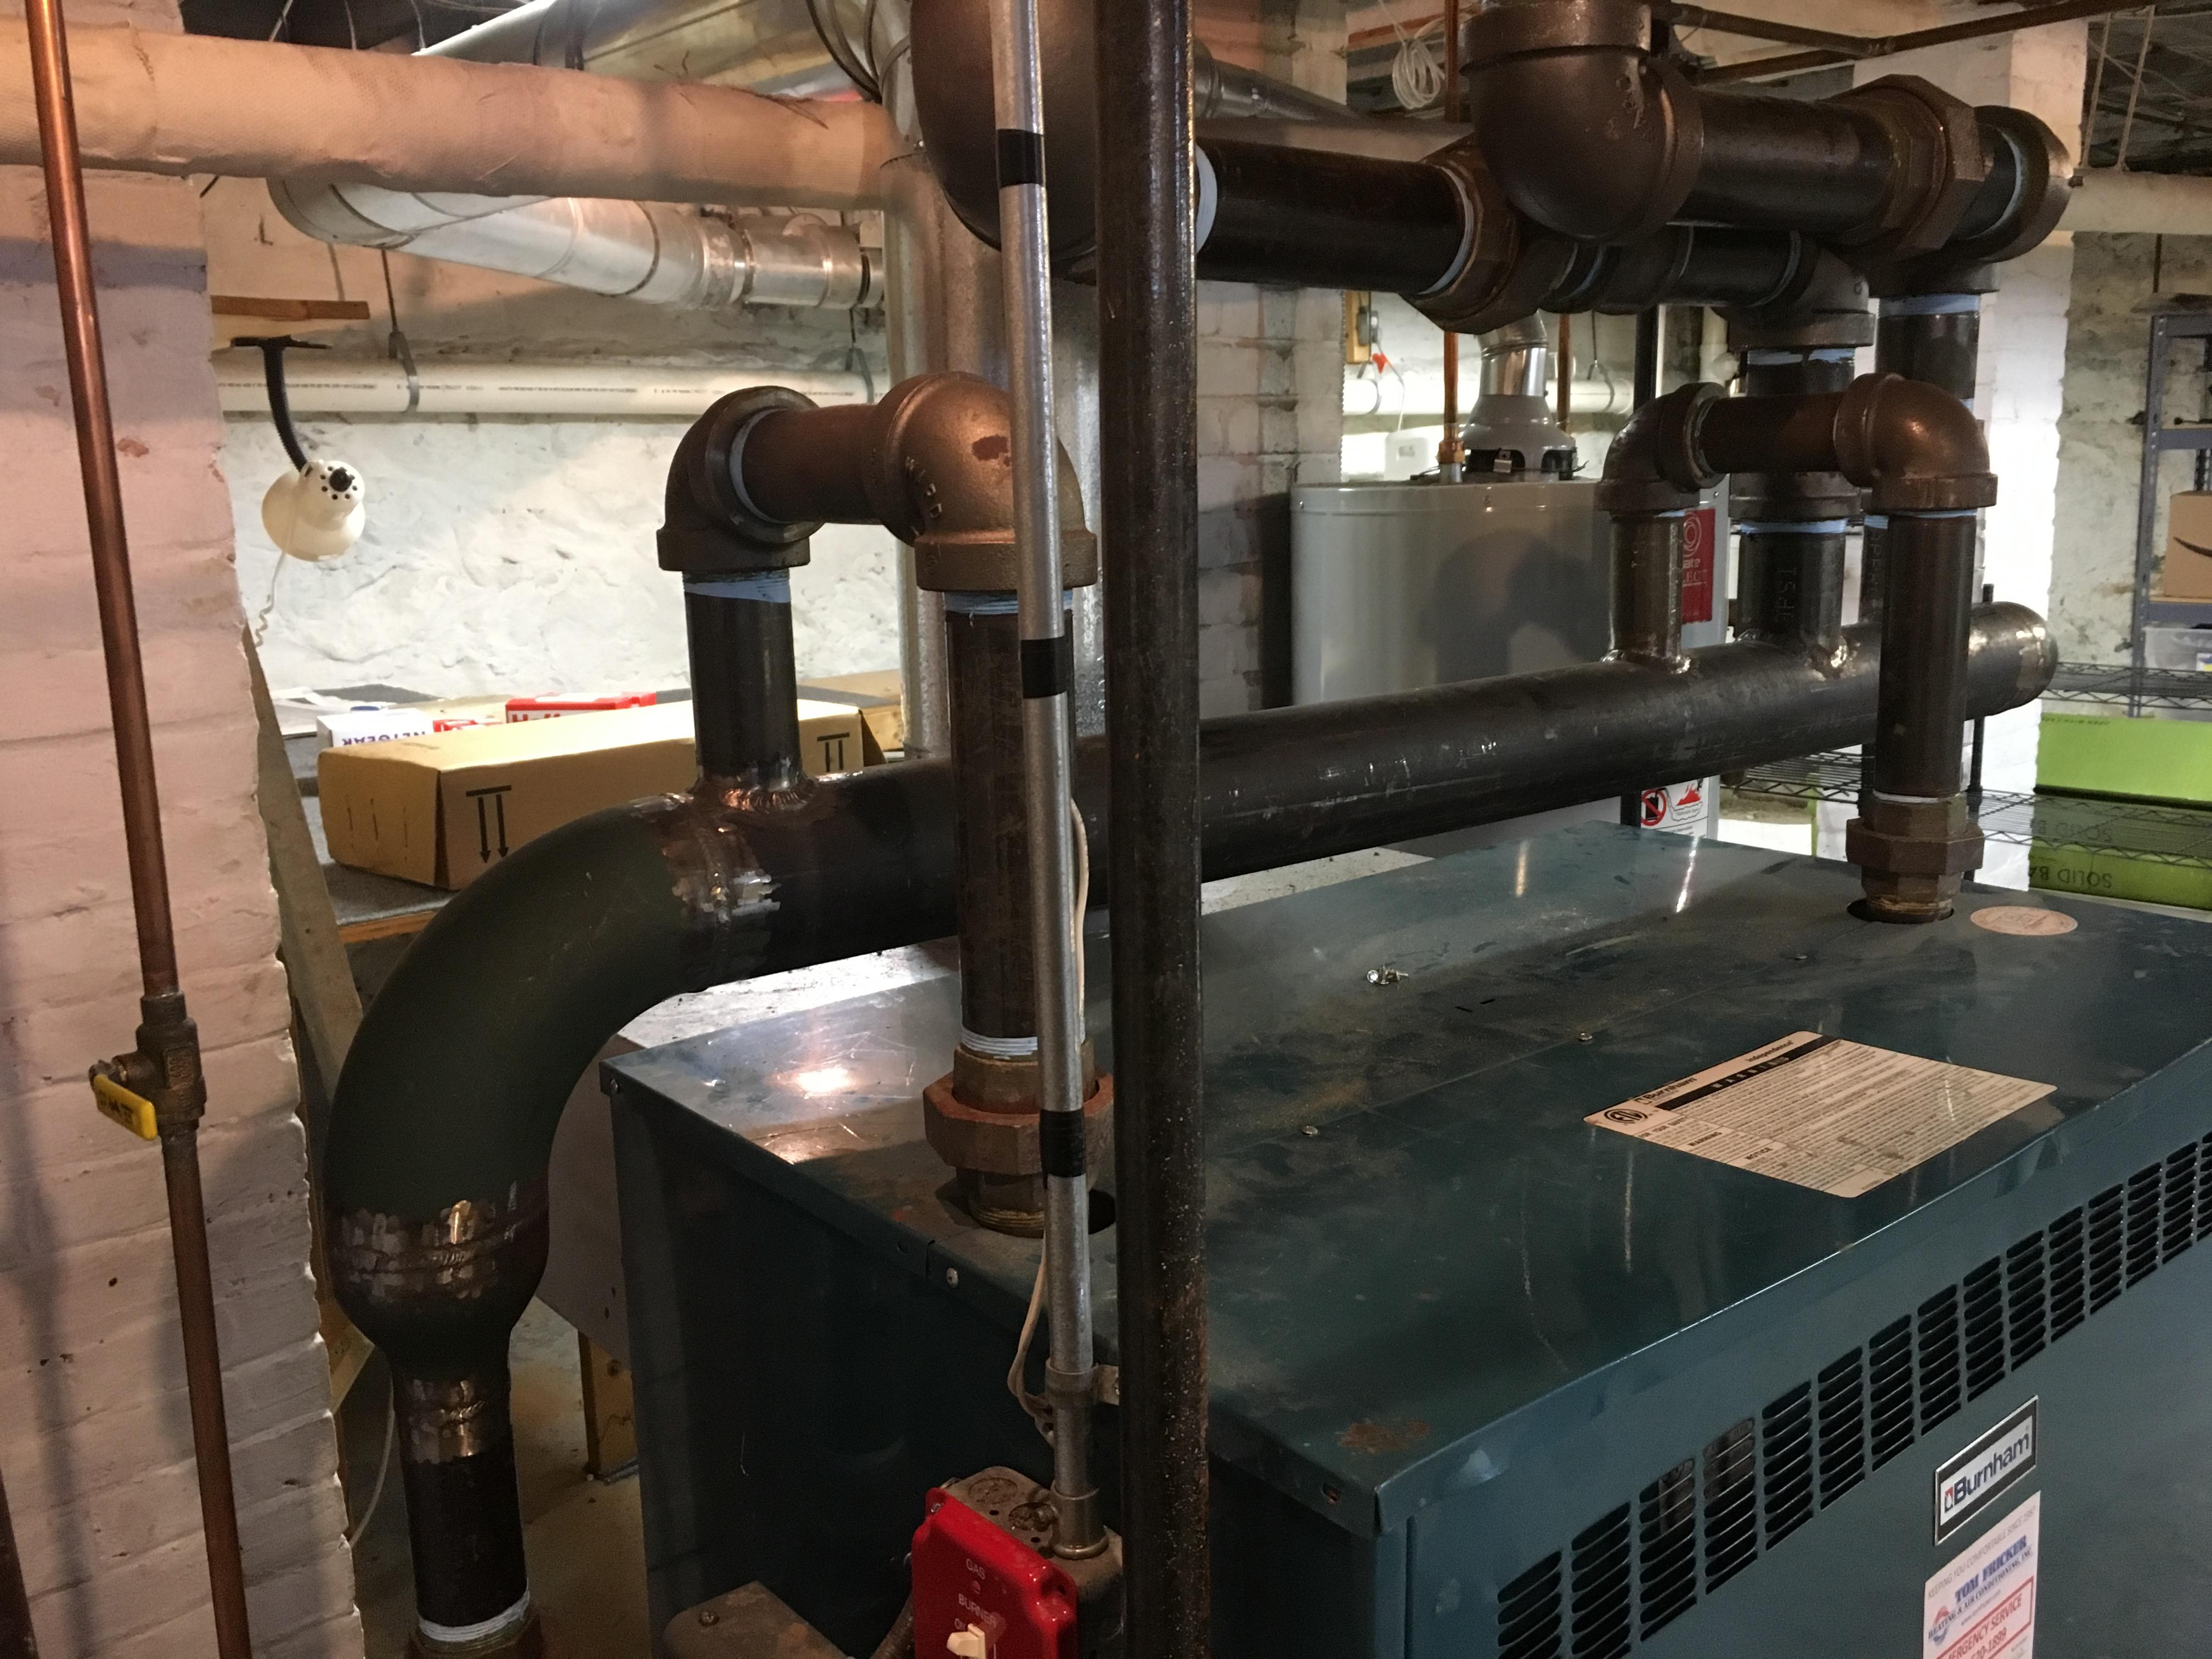 Near Boiler Piping Layout Heating Help The Wall Books F3d030b7 14b7 492f 85ea 6c3a993a4134jpeg 2m